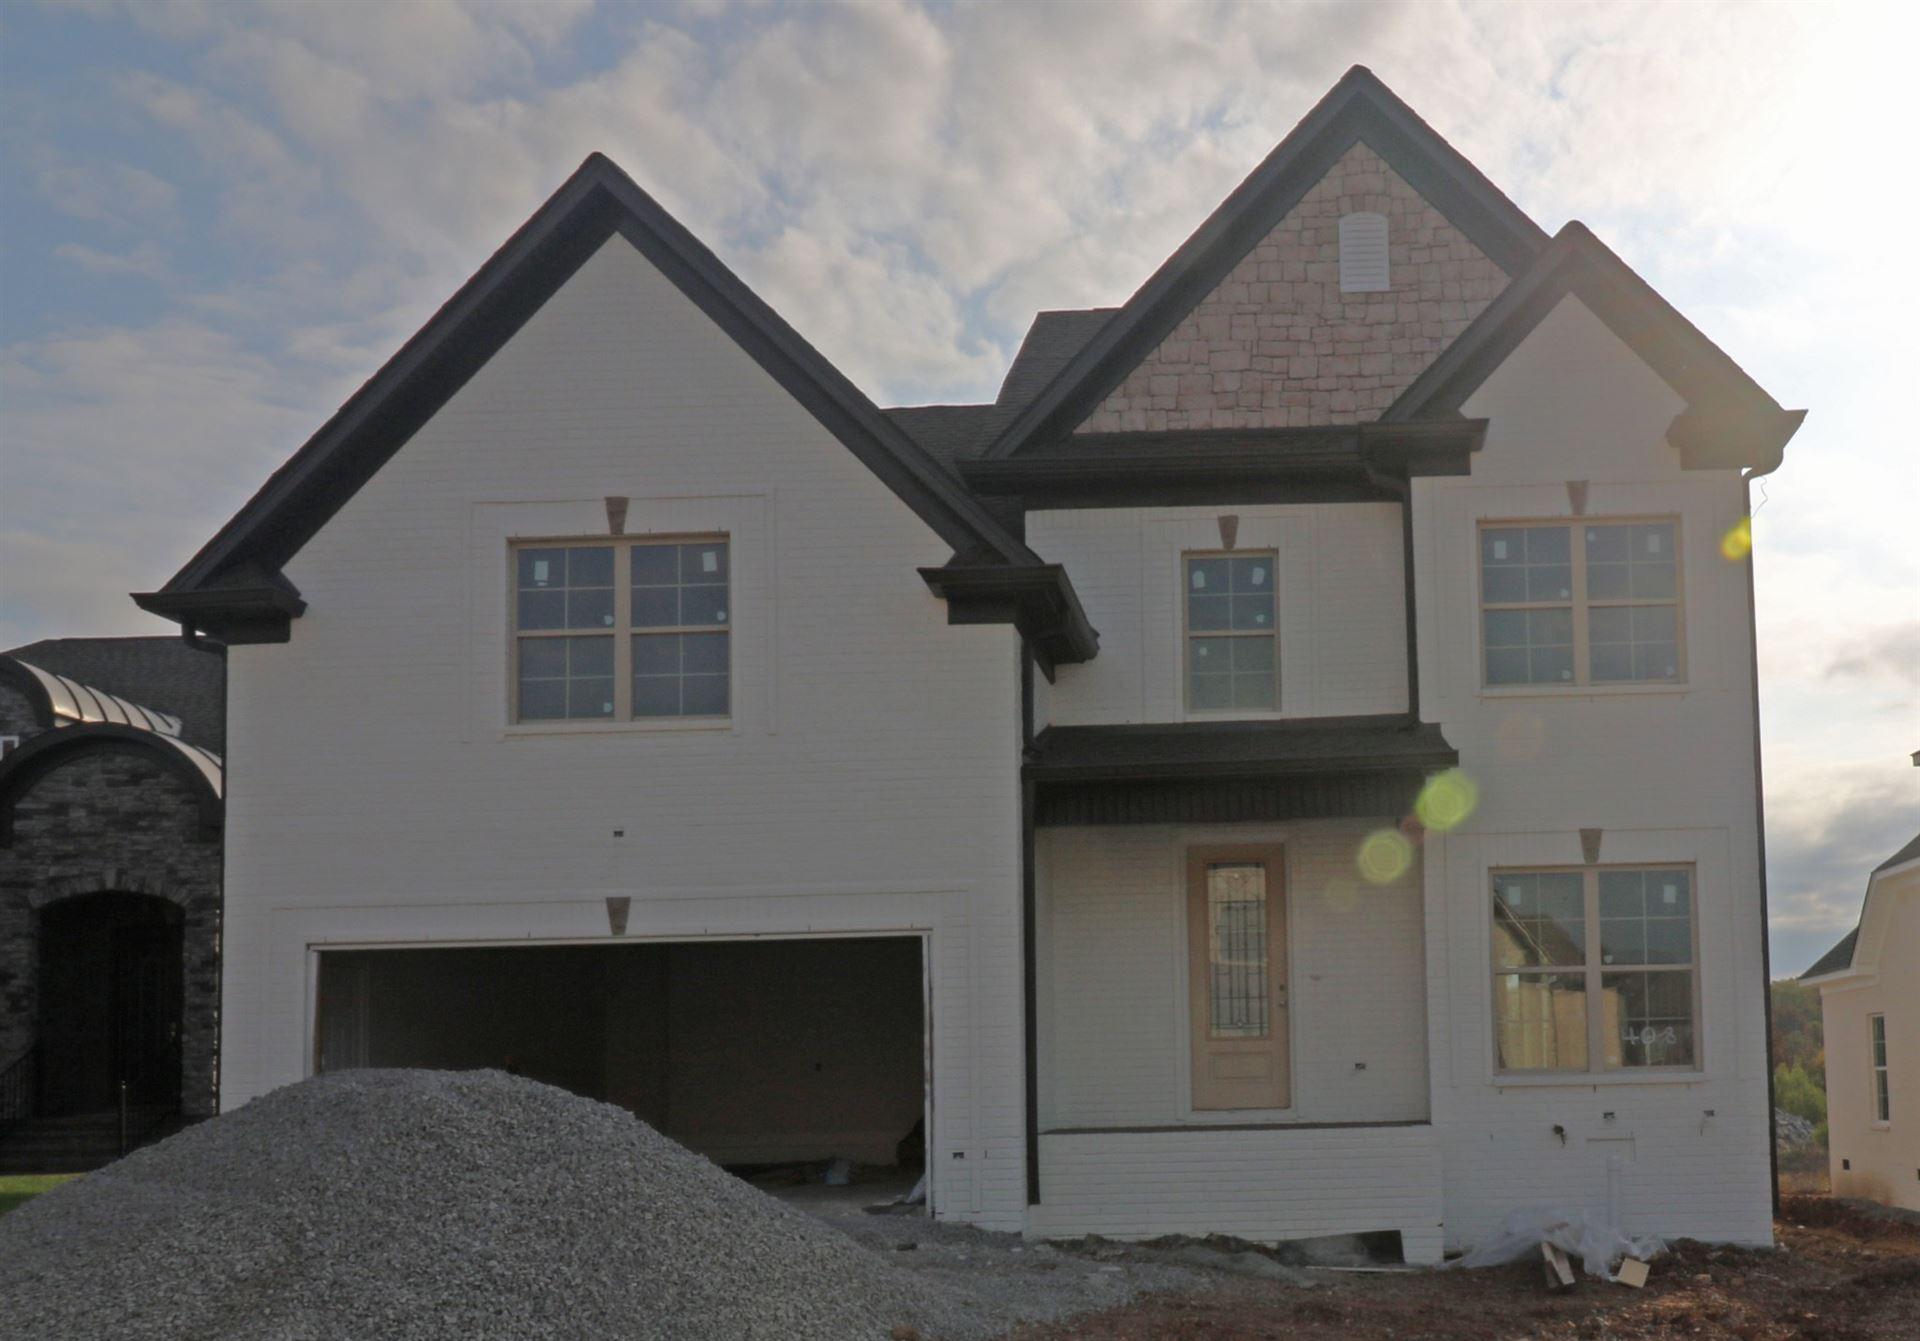 122 Shady Hollow Drive, Mount Juliet, TN 37122 - MLS#: 2142753